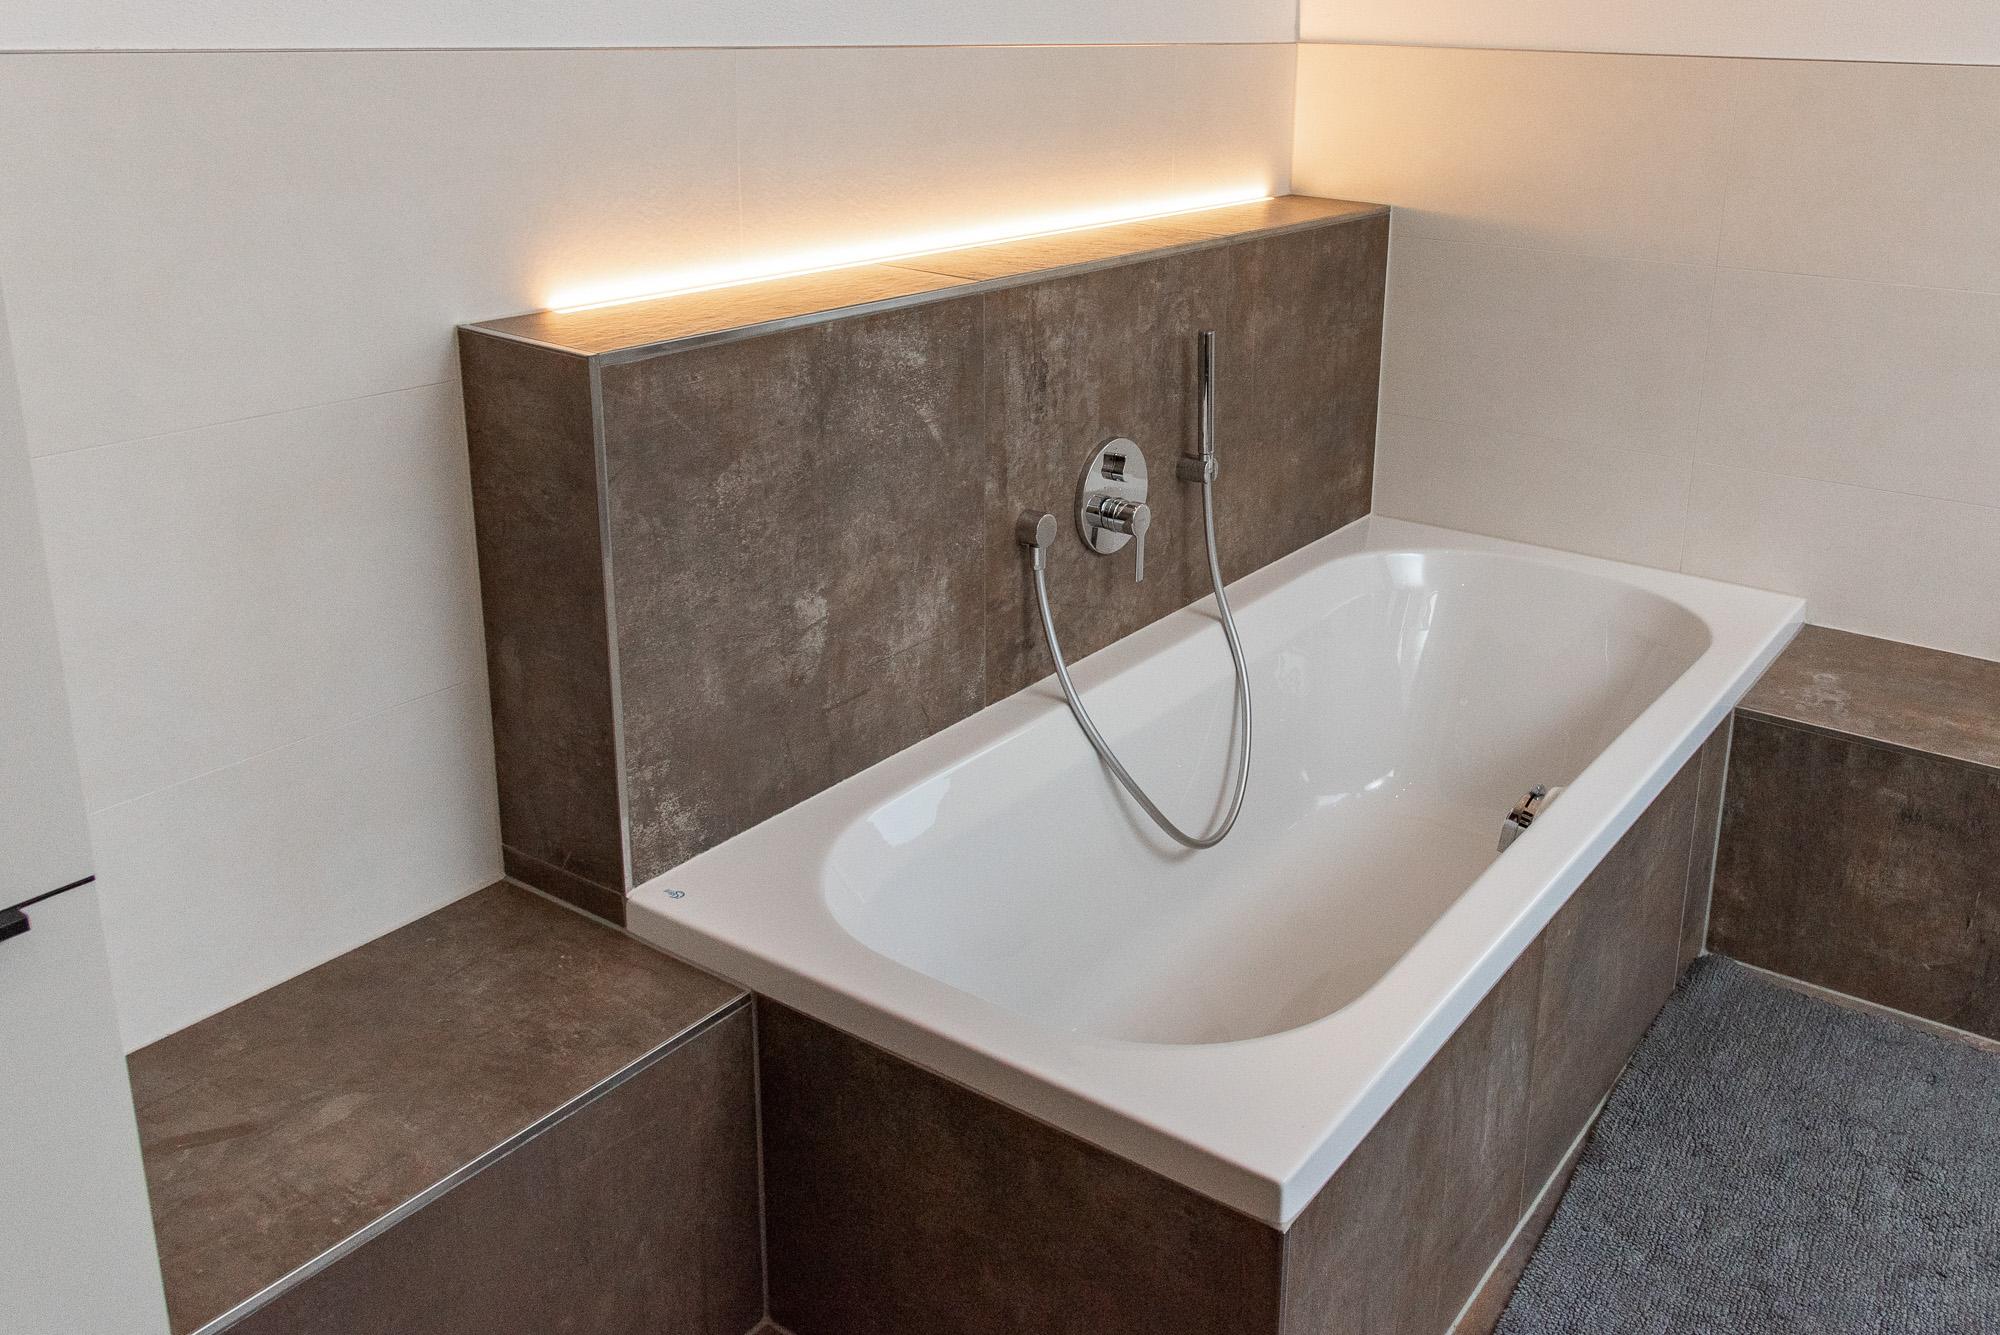 Beleuchtung Badewanne Elektriker Kematen/Ybbs